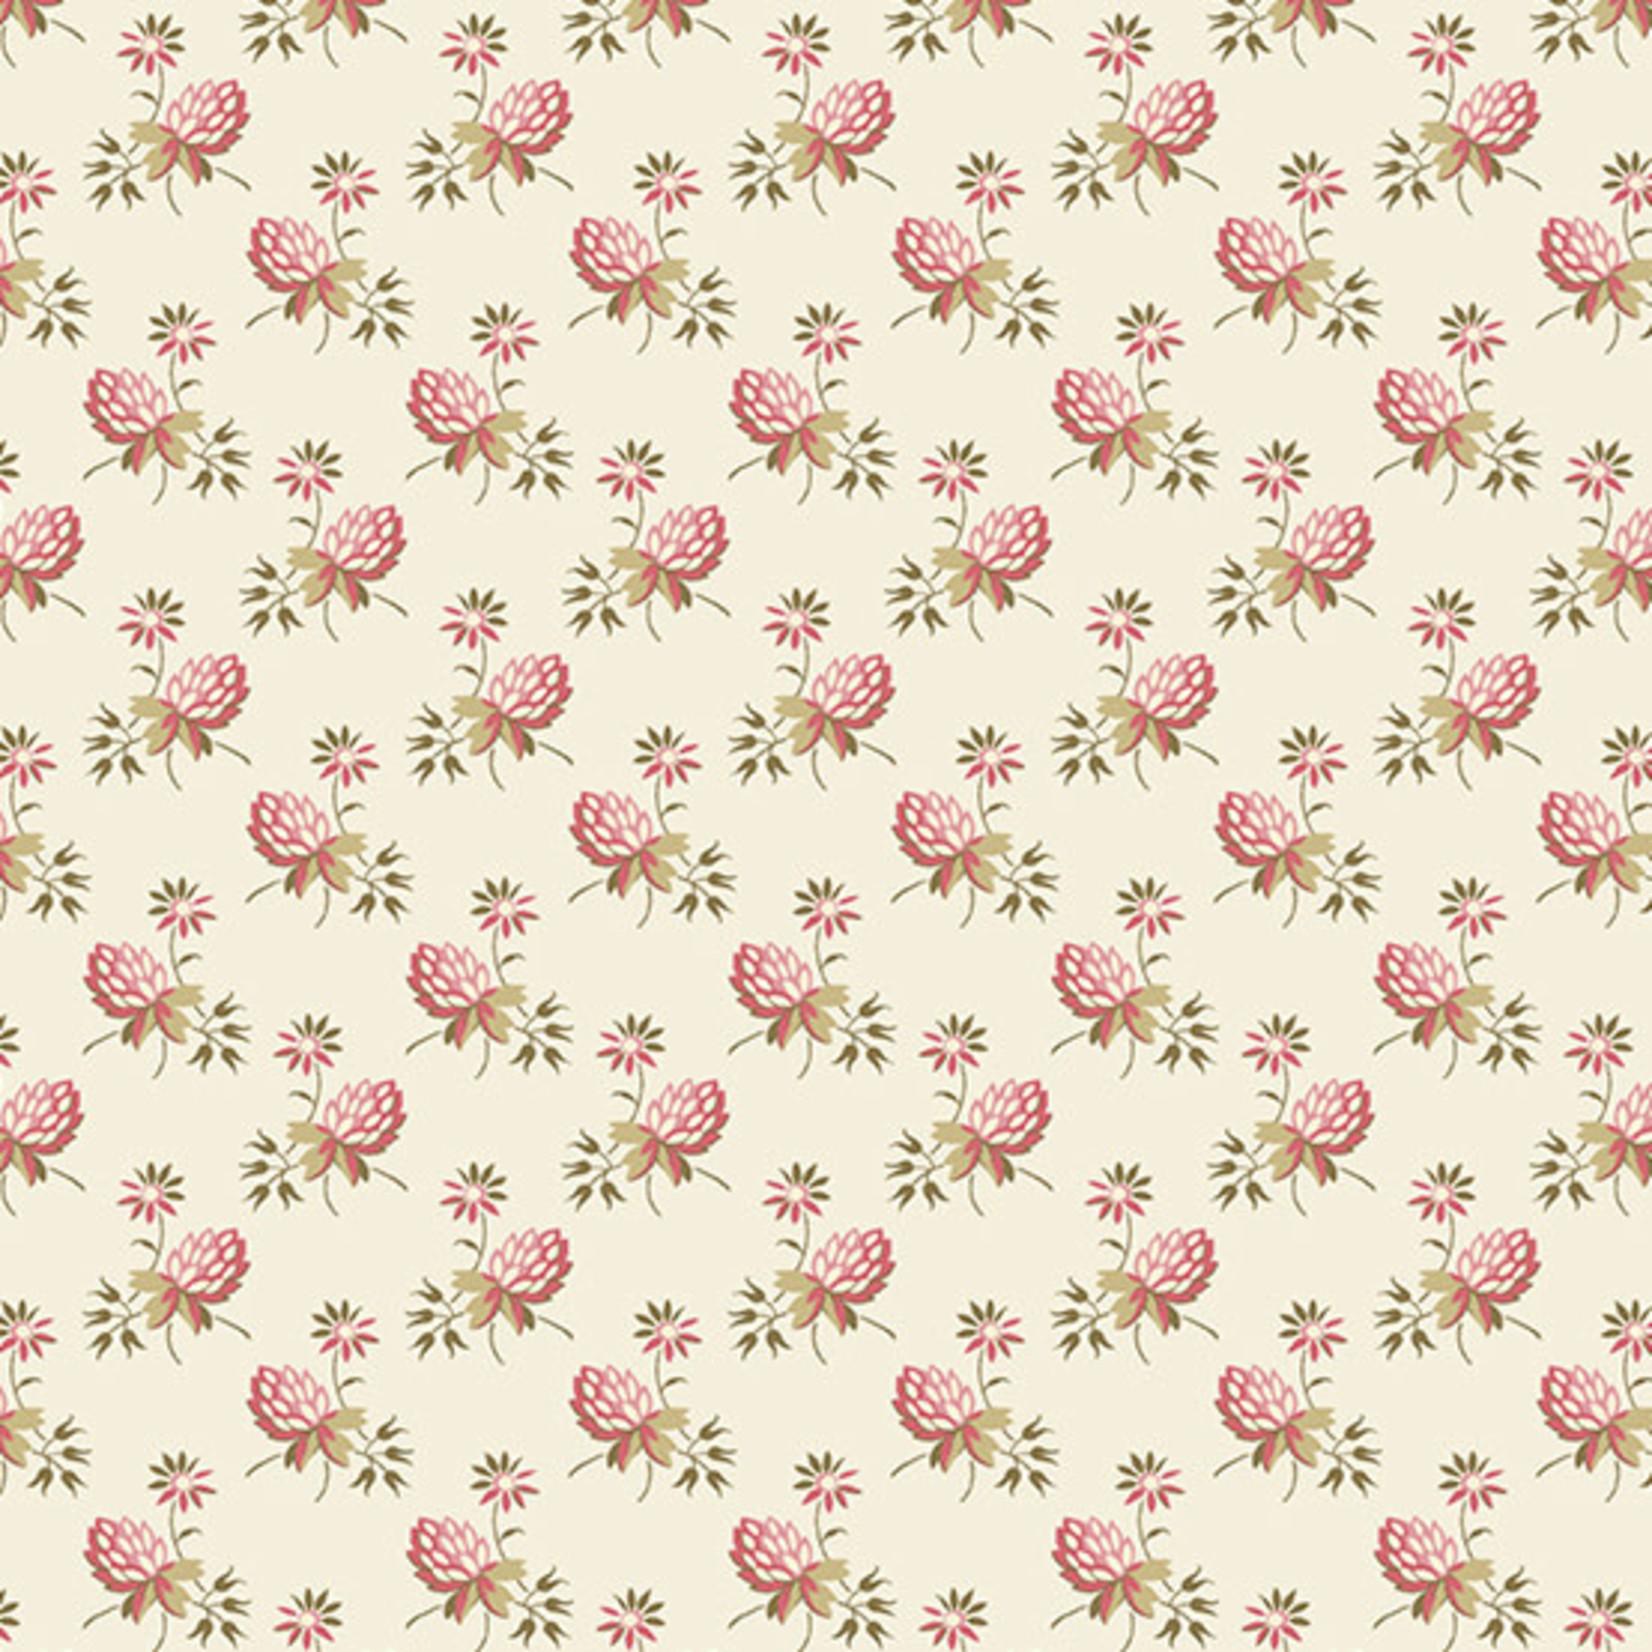 Edyta Sitar Secret Stash - Neutrals, Clover, Cream (9451-E) $0.20 per cm or $20/m